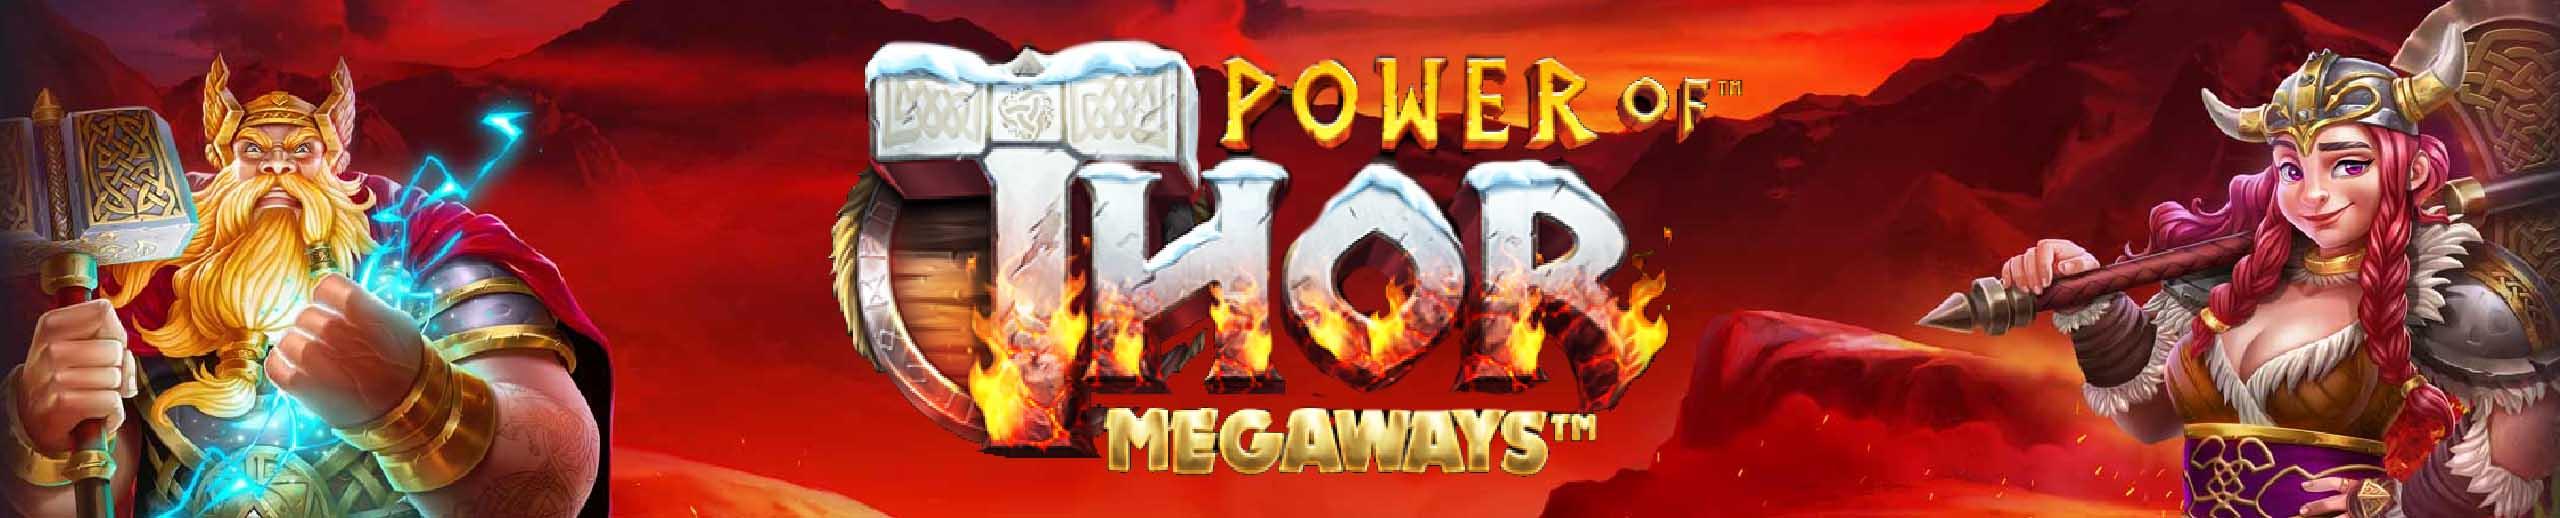 Power of Thor MegaWays Slot Test